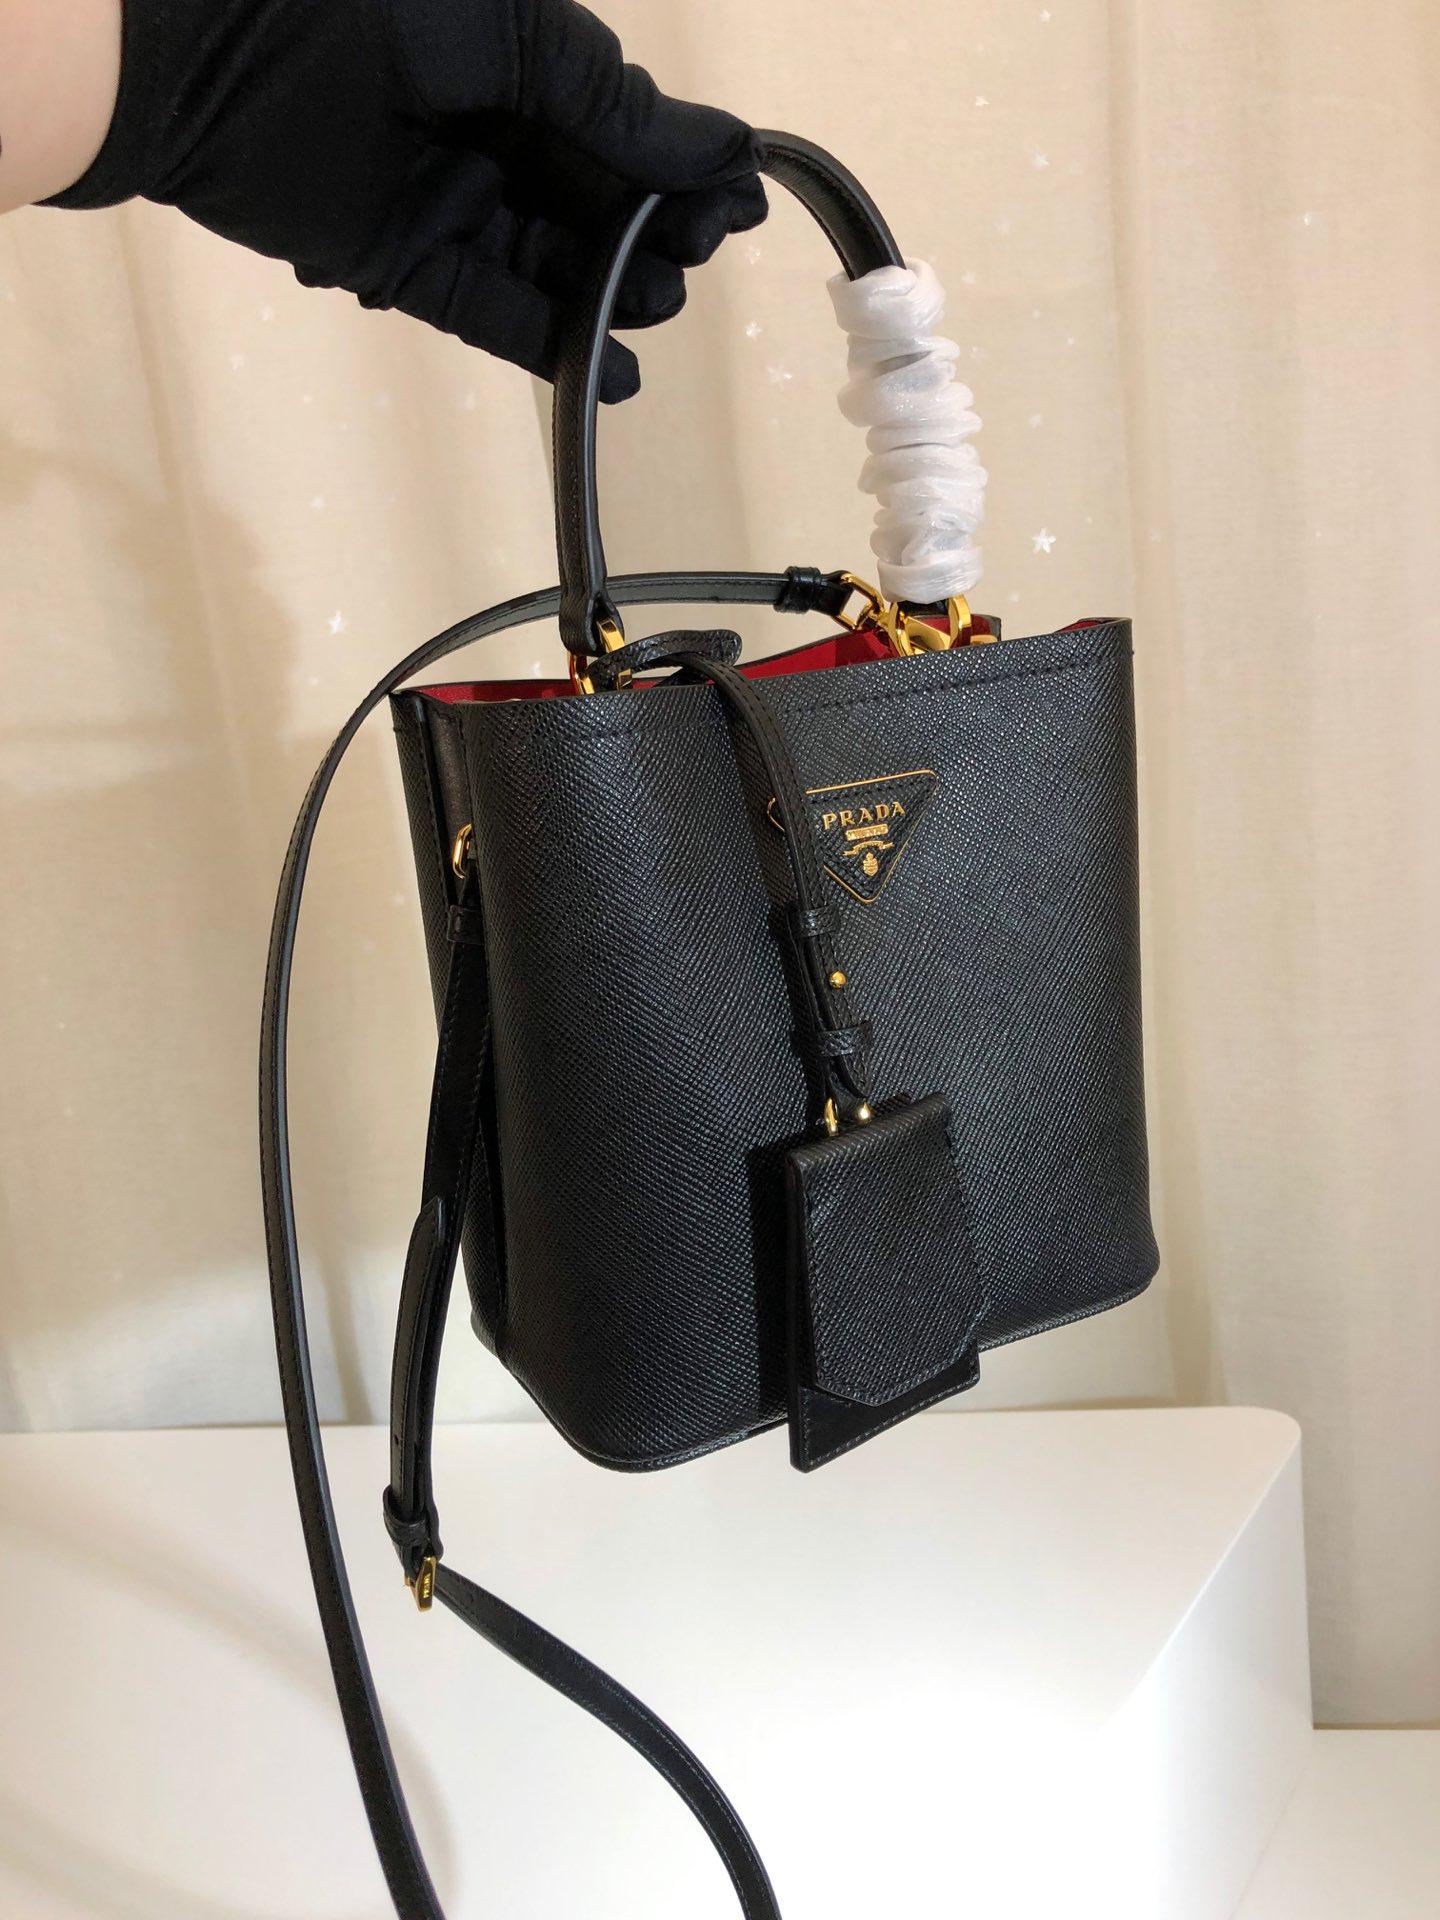 P家最新款double手袋迷你版水桶包1BA217 覆式磁扣扣合的中央口袋 原厂意大利带香味